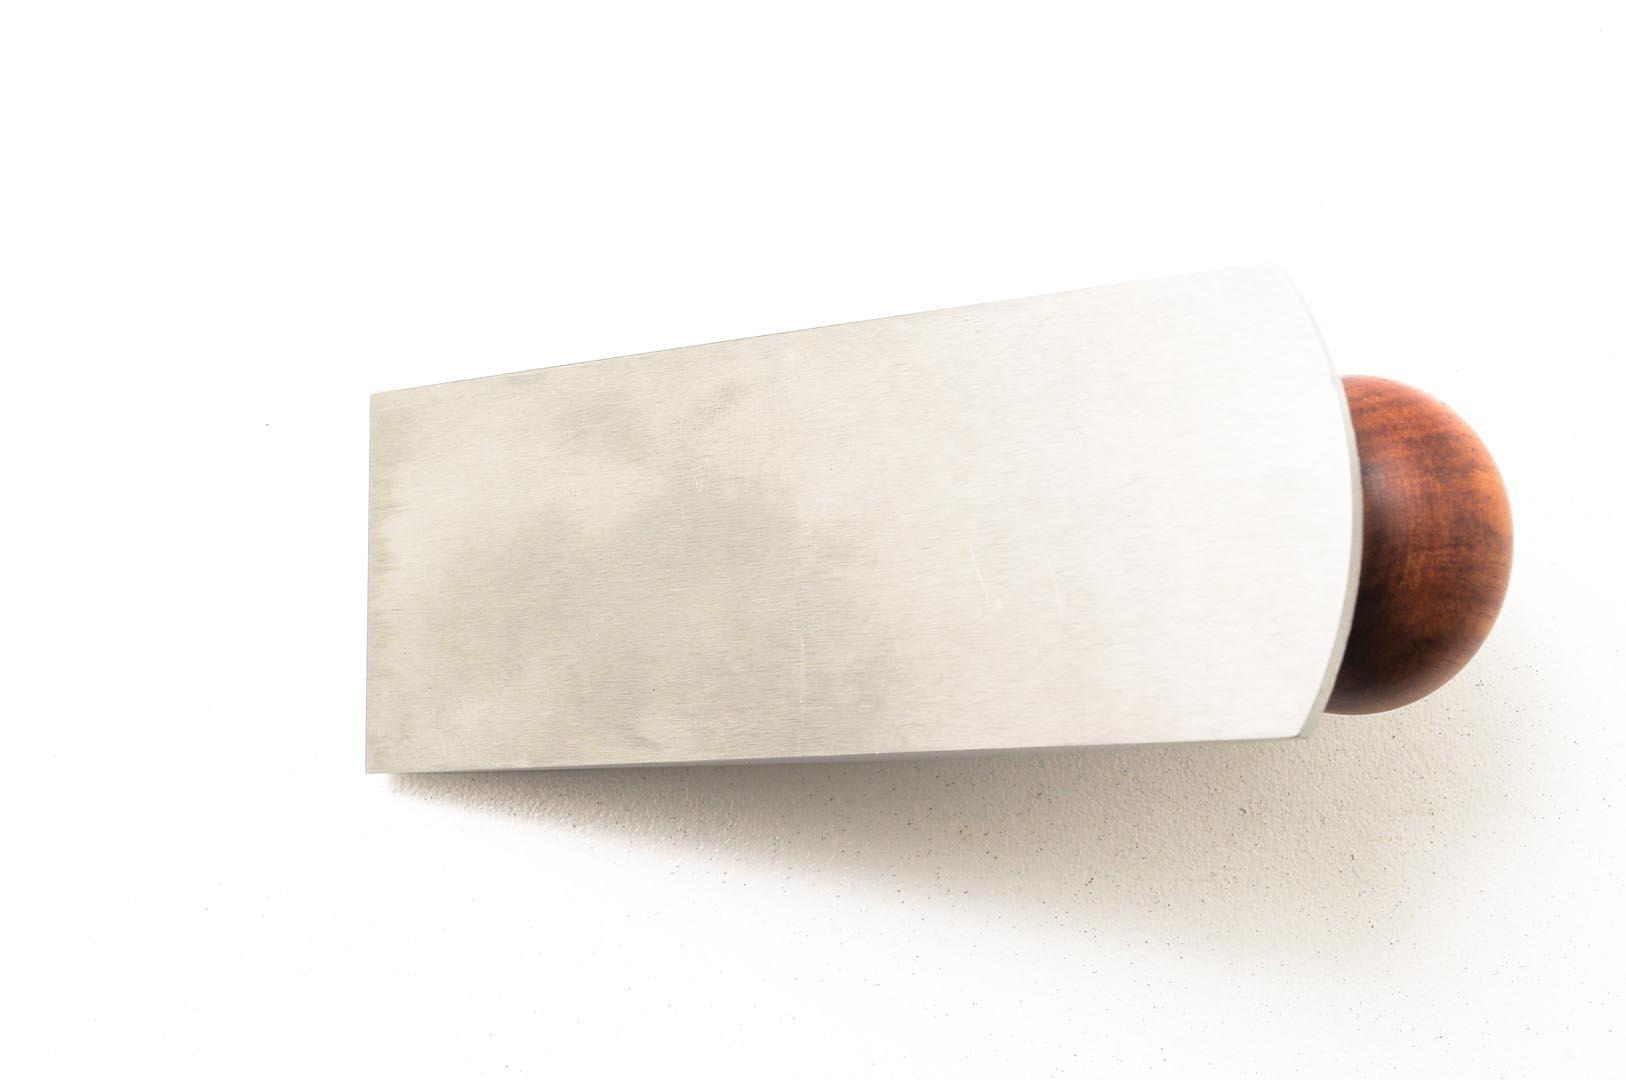 151301-Cepillo de formon pequeño WoodRiver 151301-max-6.